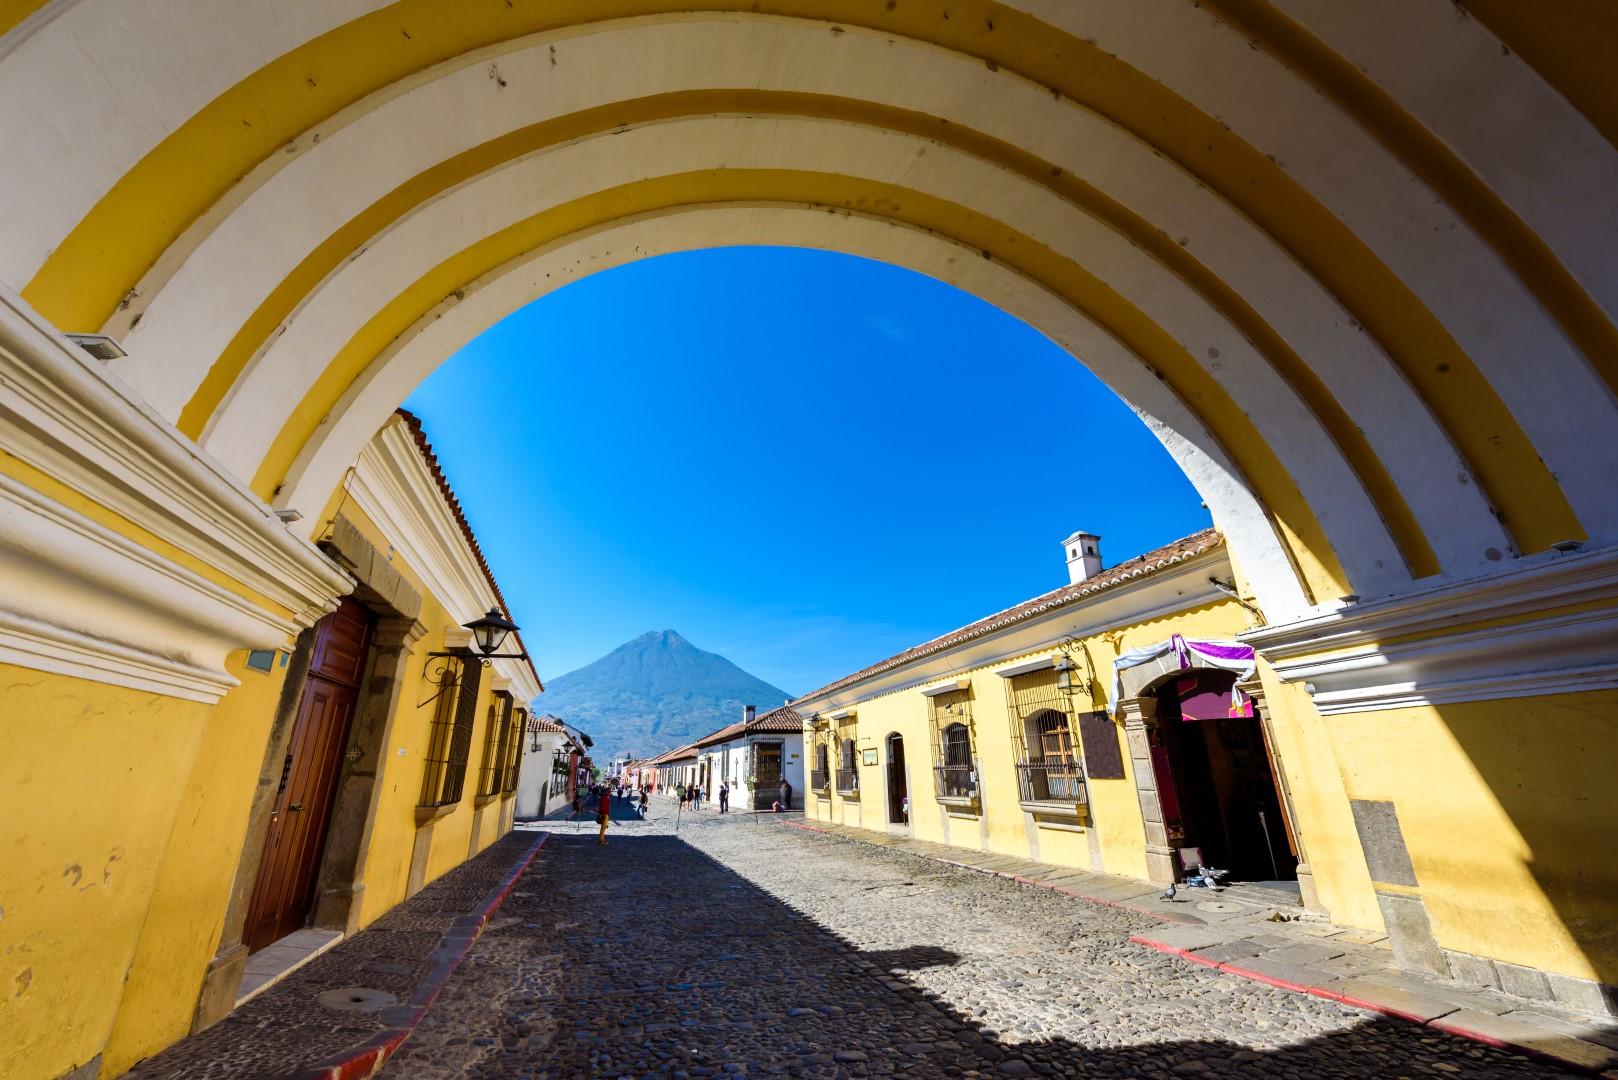 Underneath the Arco De Santa Catalina in Antigua, Guatemala